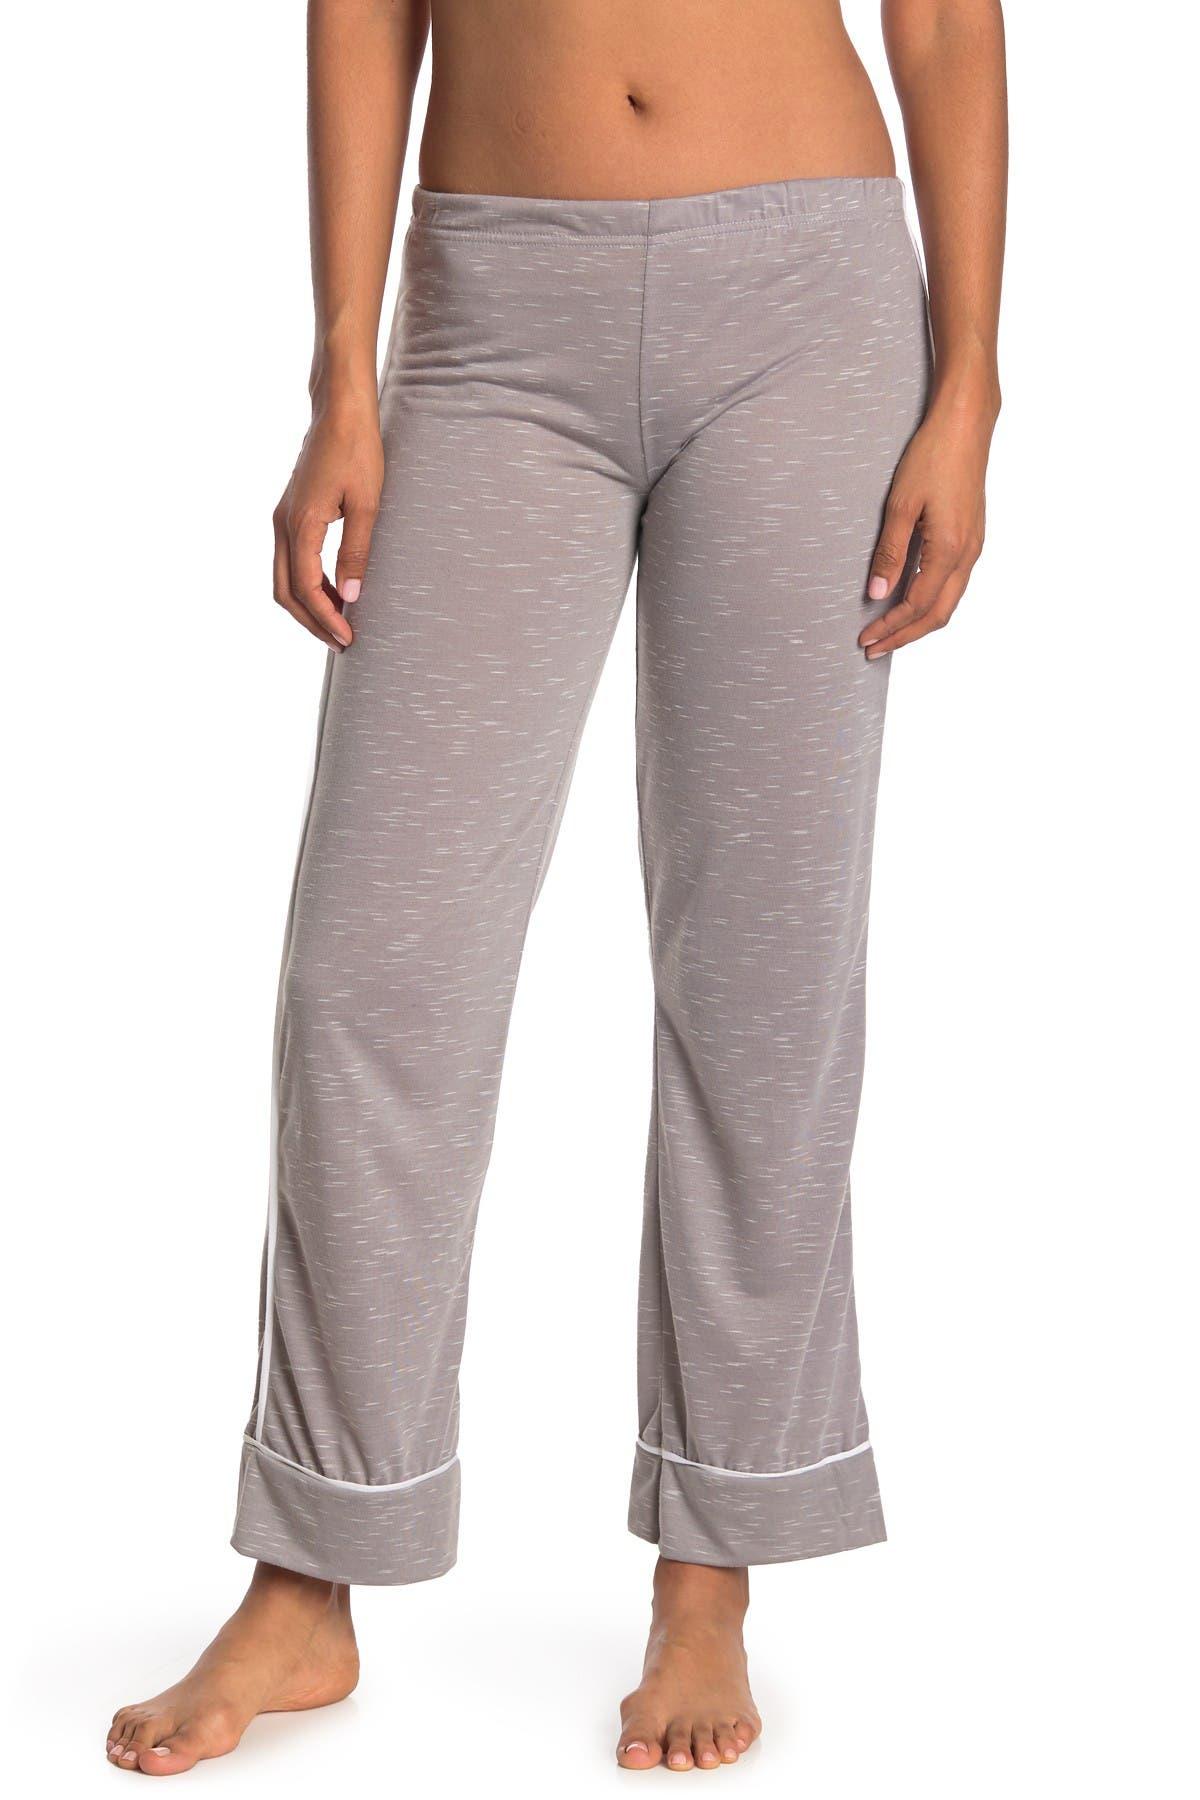 Image of Kathy Ireland Polka Dot Pajama Pants